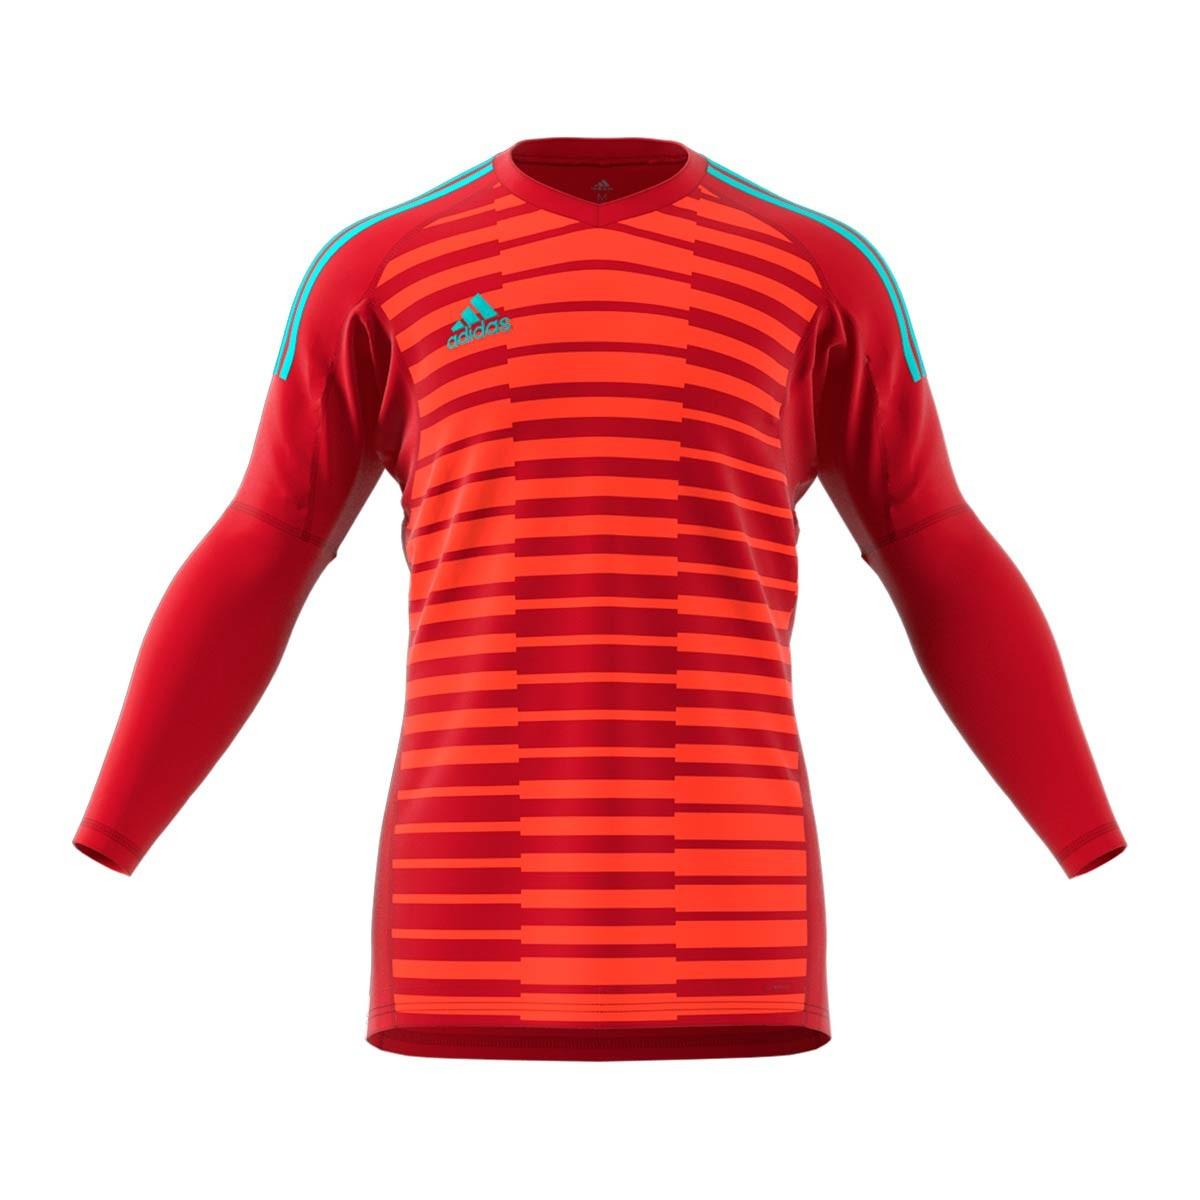 ... Camiseta AdiPro 18 Goalkeeper Longsleeve Power red-Semi solar red-Energy  aqua. CATEGORY 5385864df